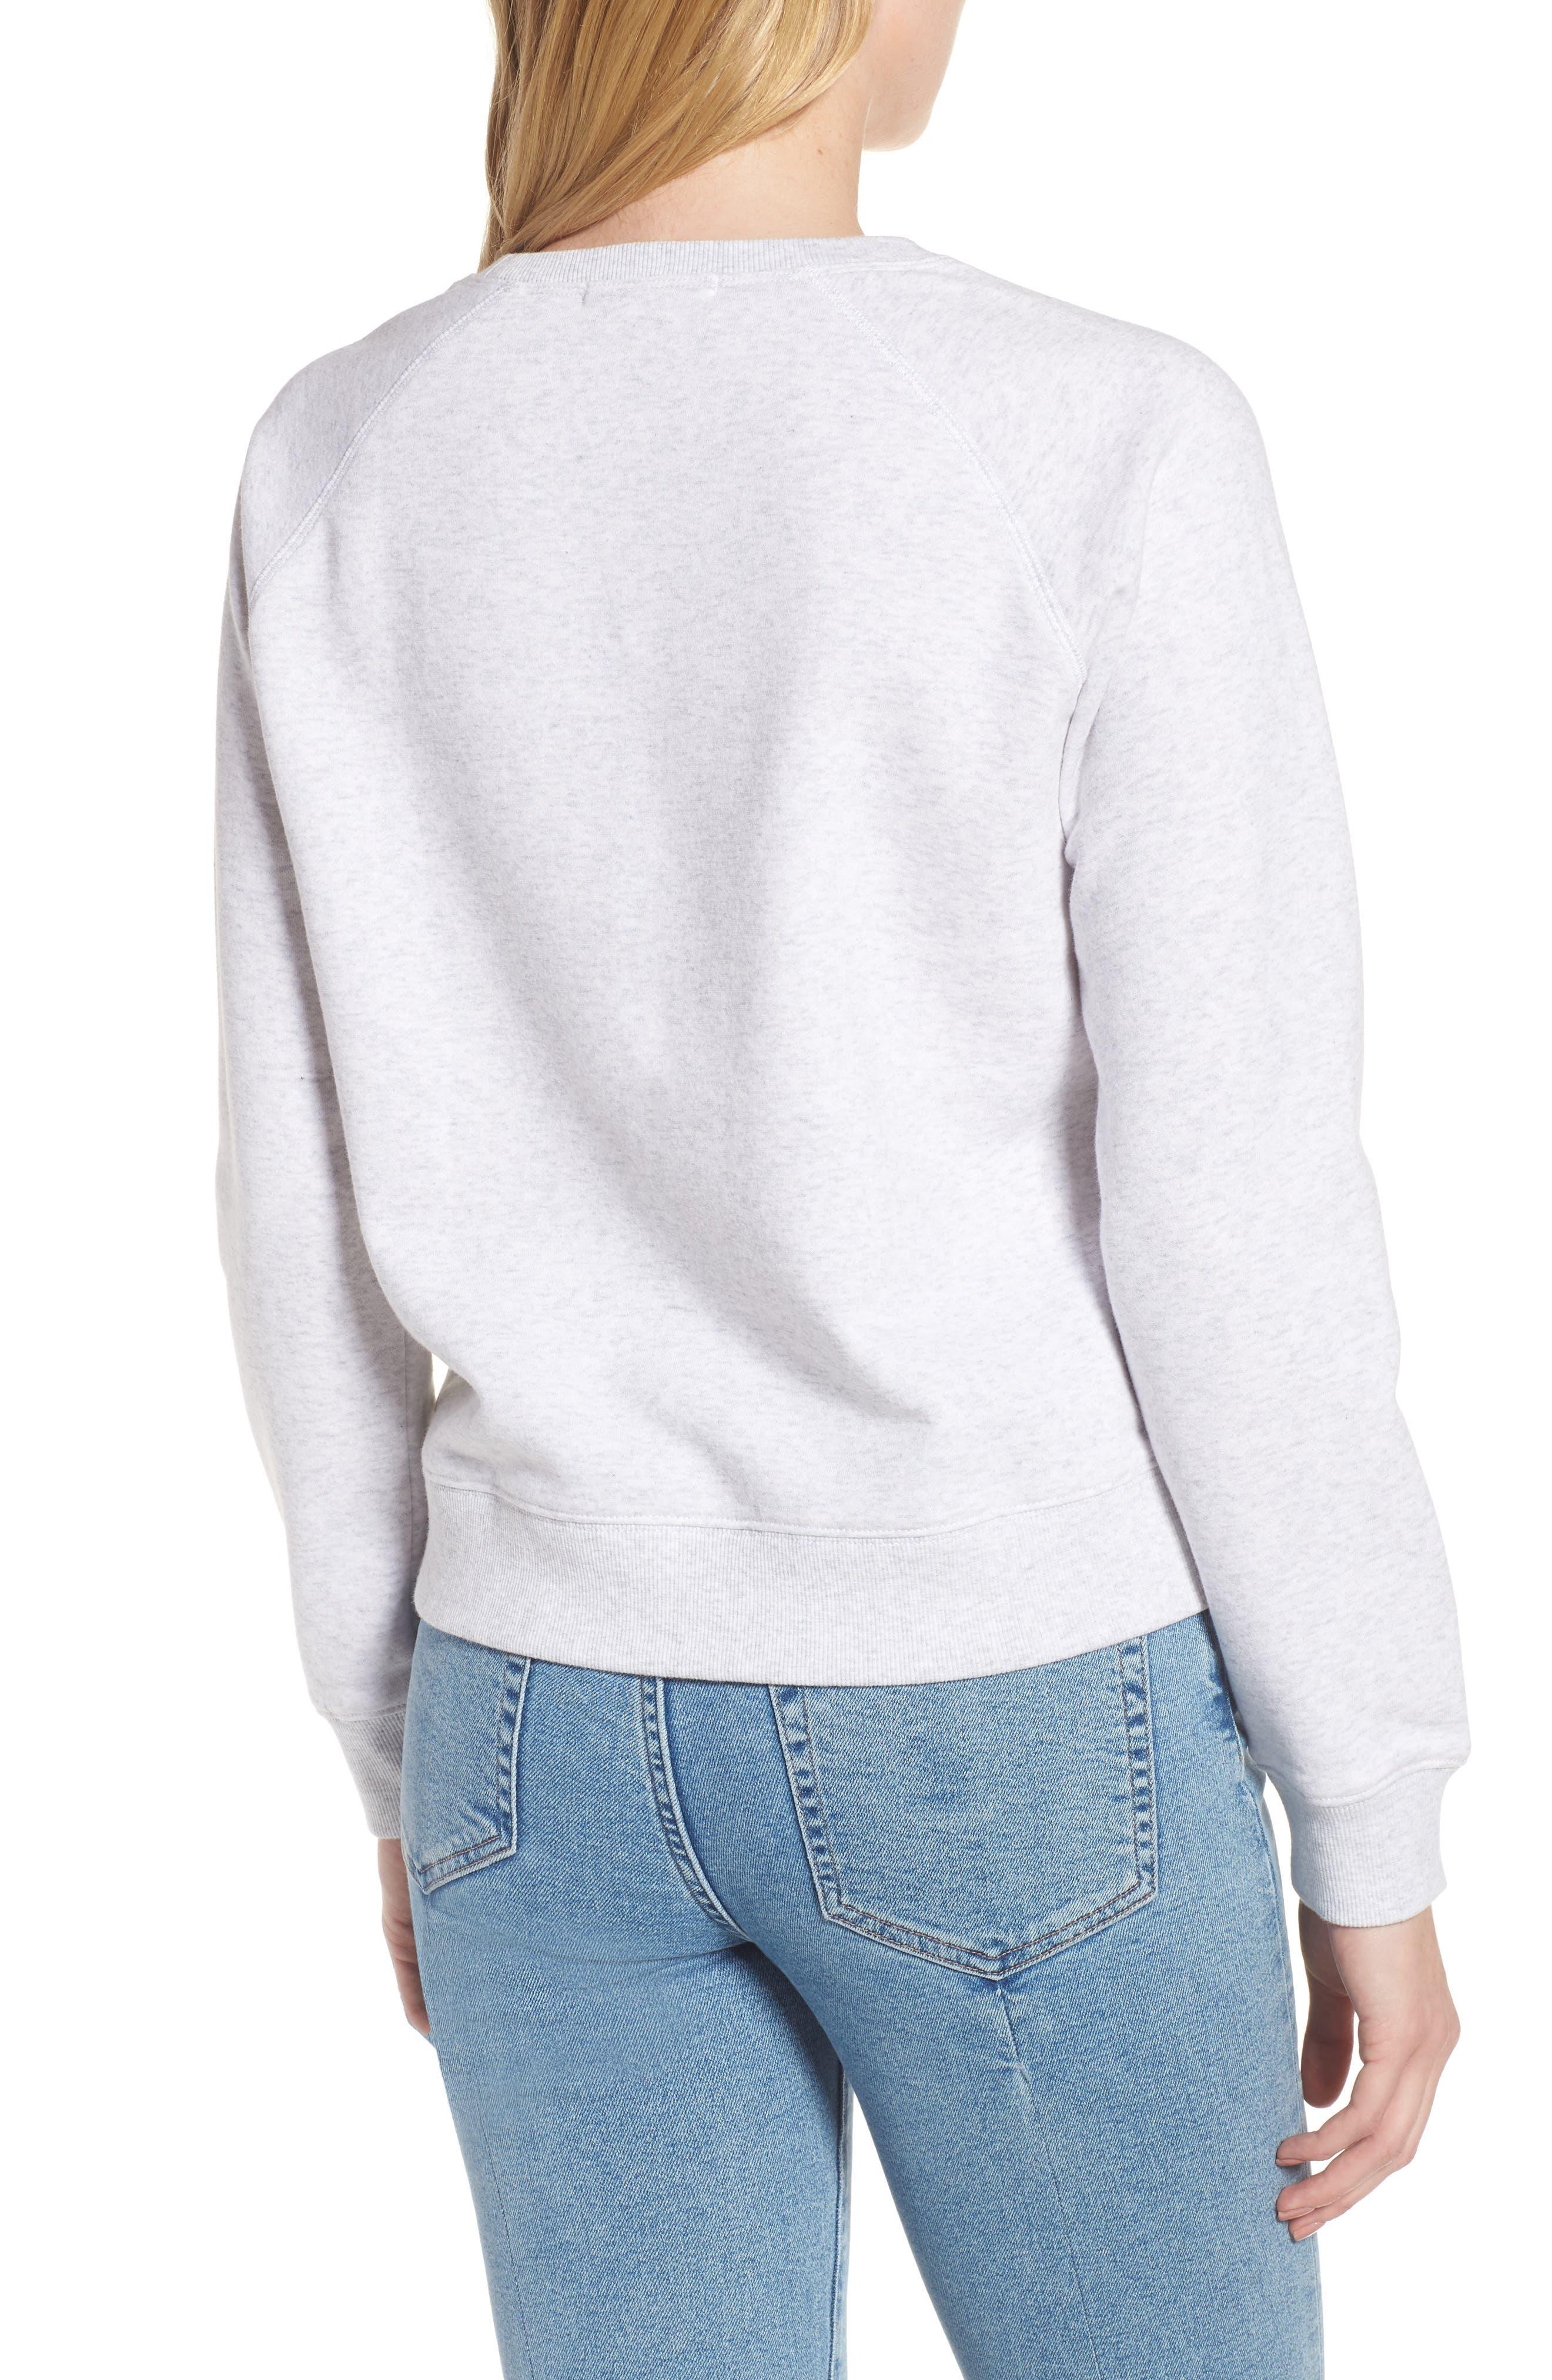 Alternate Image 2  - Rebecca Minkoff Girl Power Sweatshirt